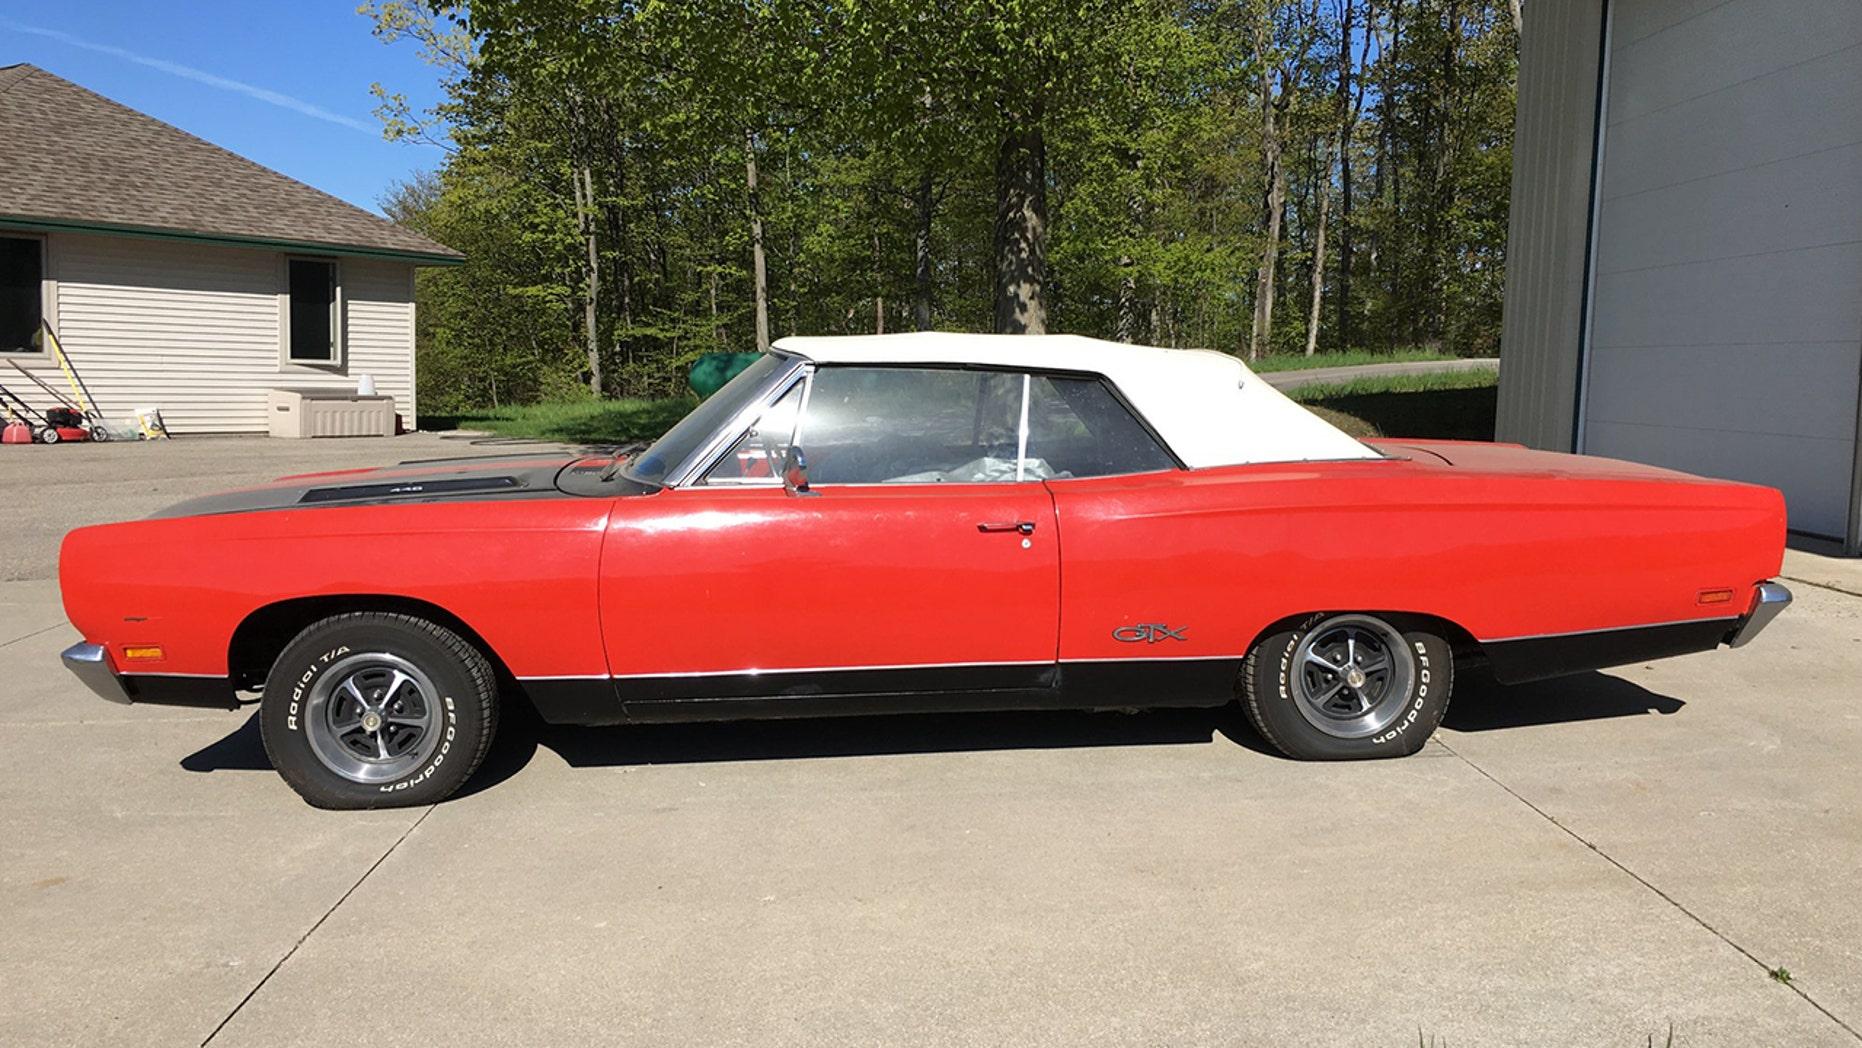 Rare 1969 Plymouth GTX side view